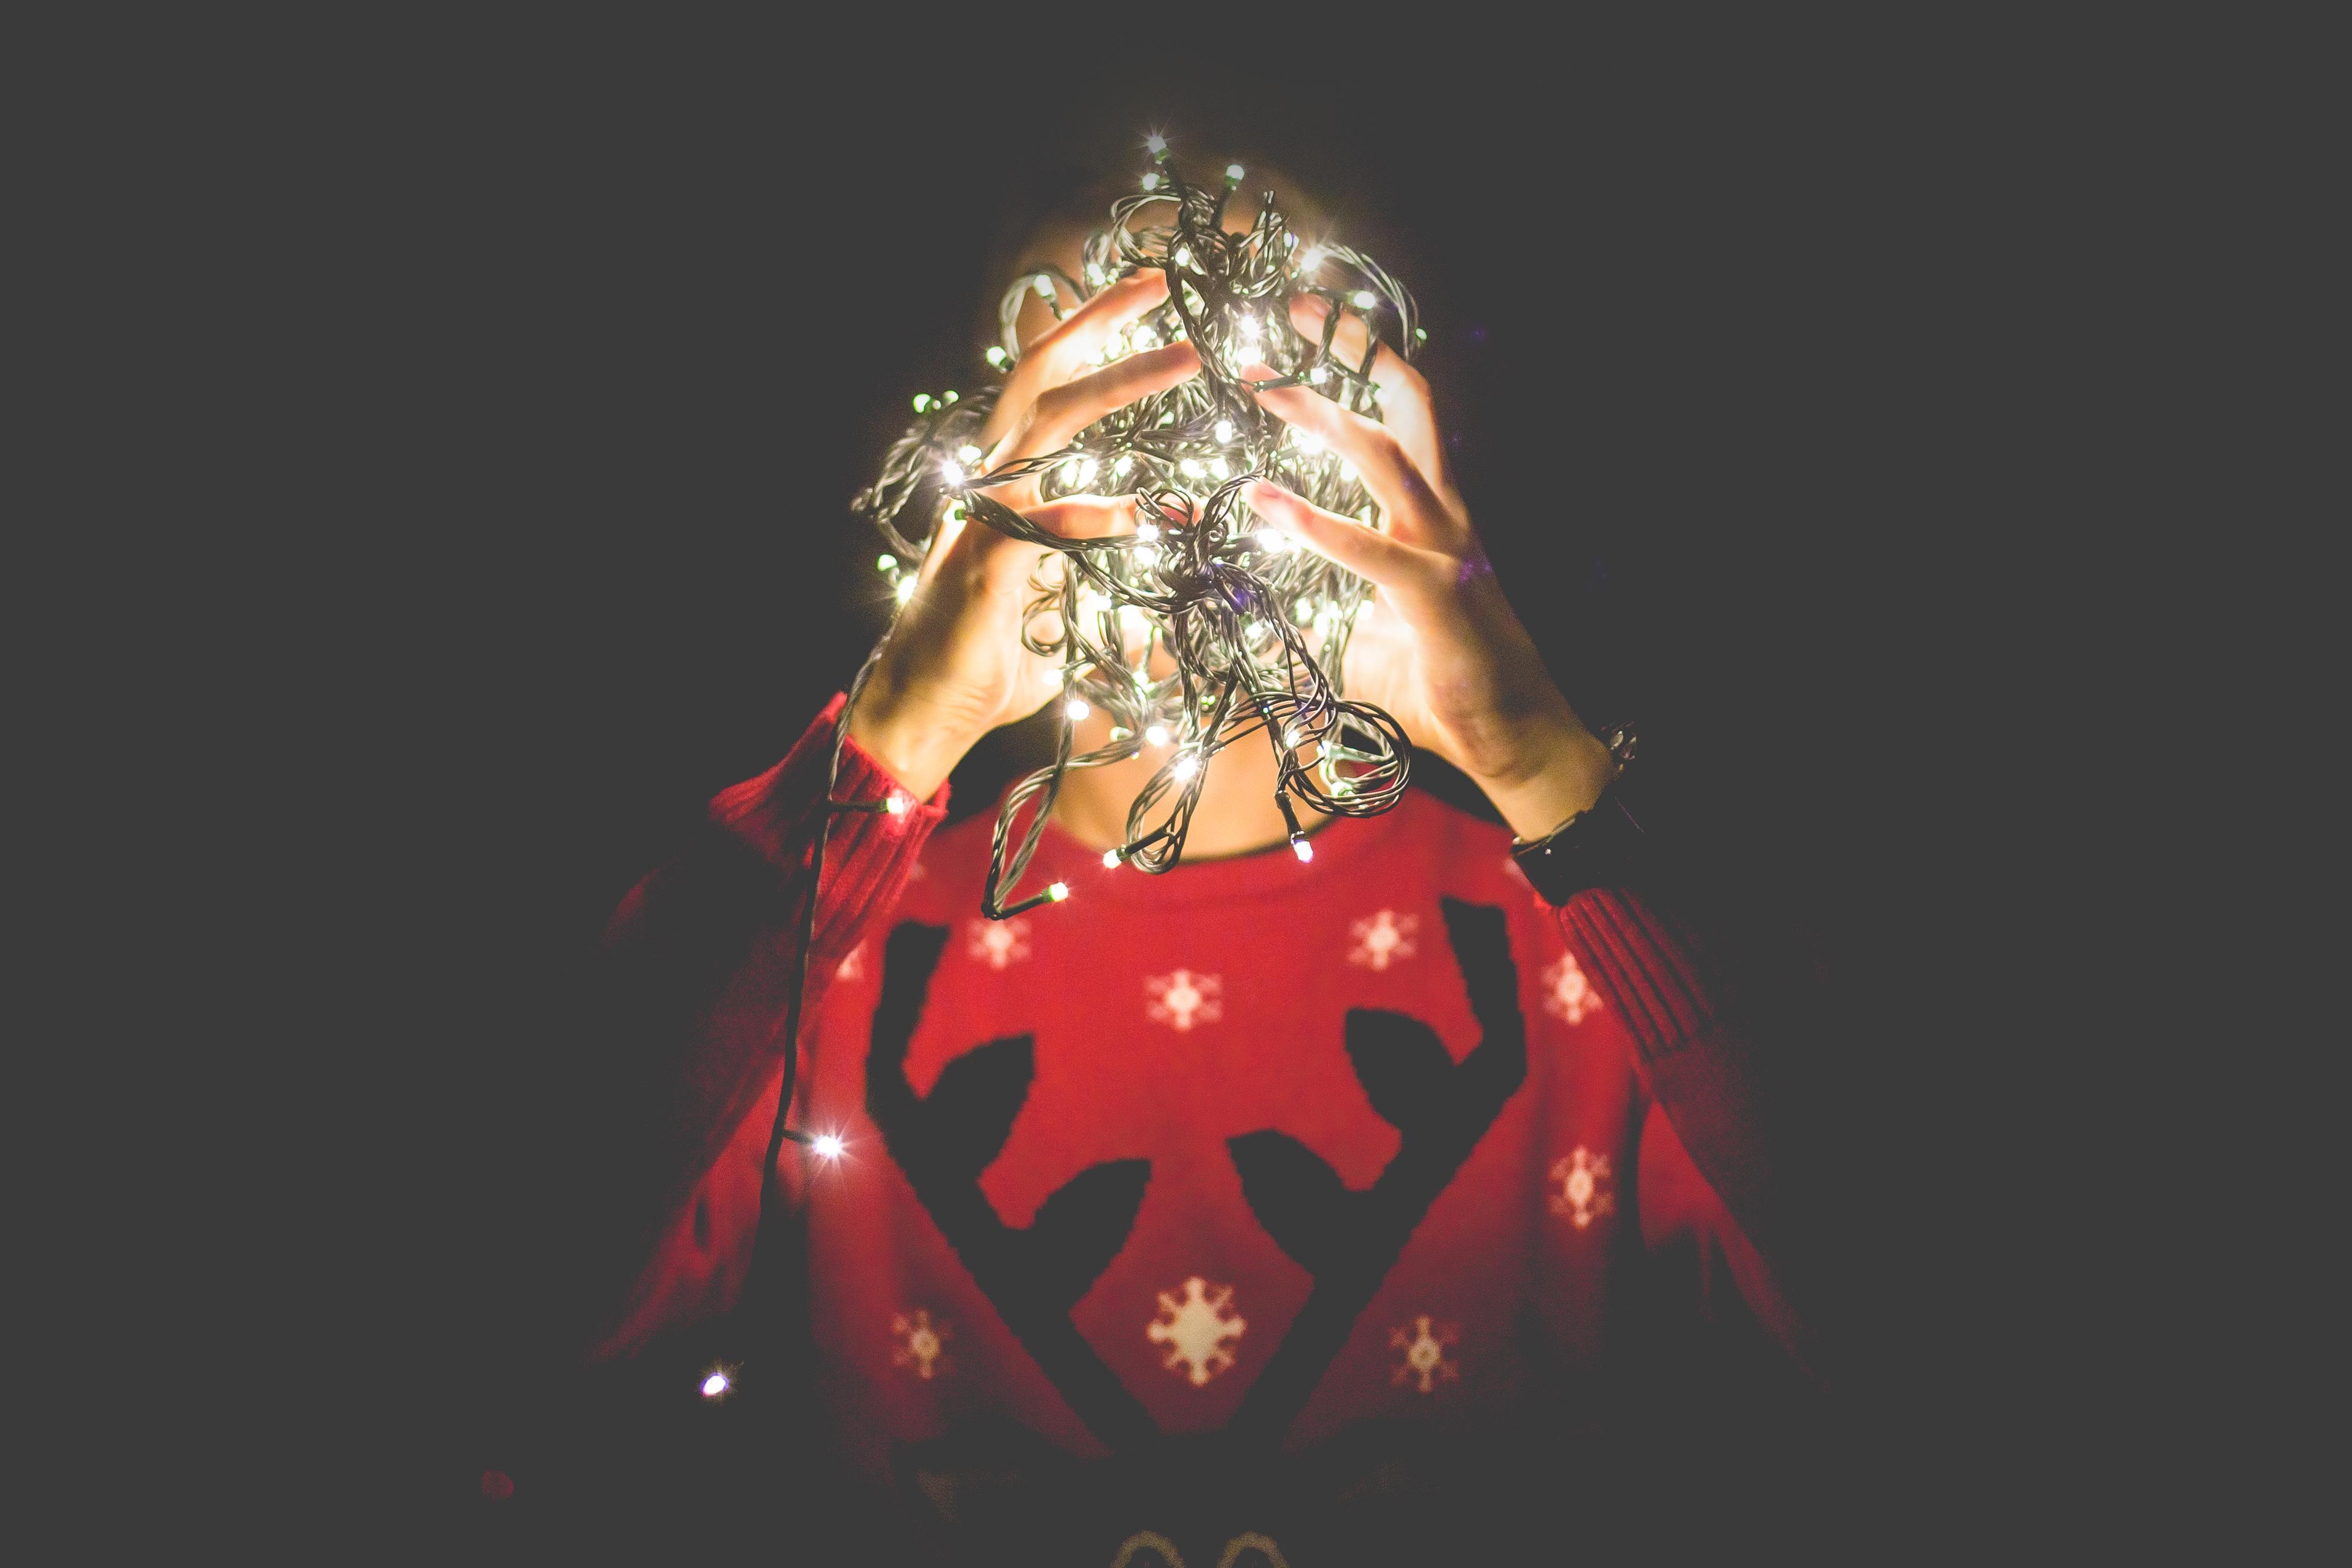 tangled-christmas-lights-instead-of-my-head-picjumbo-com